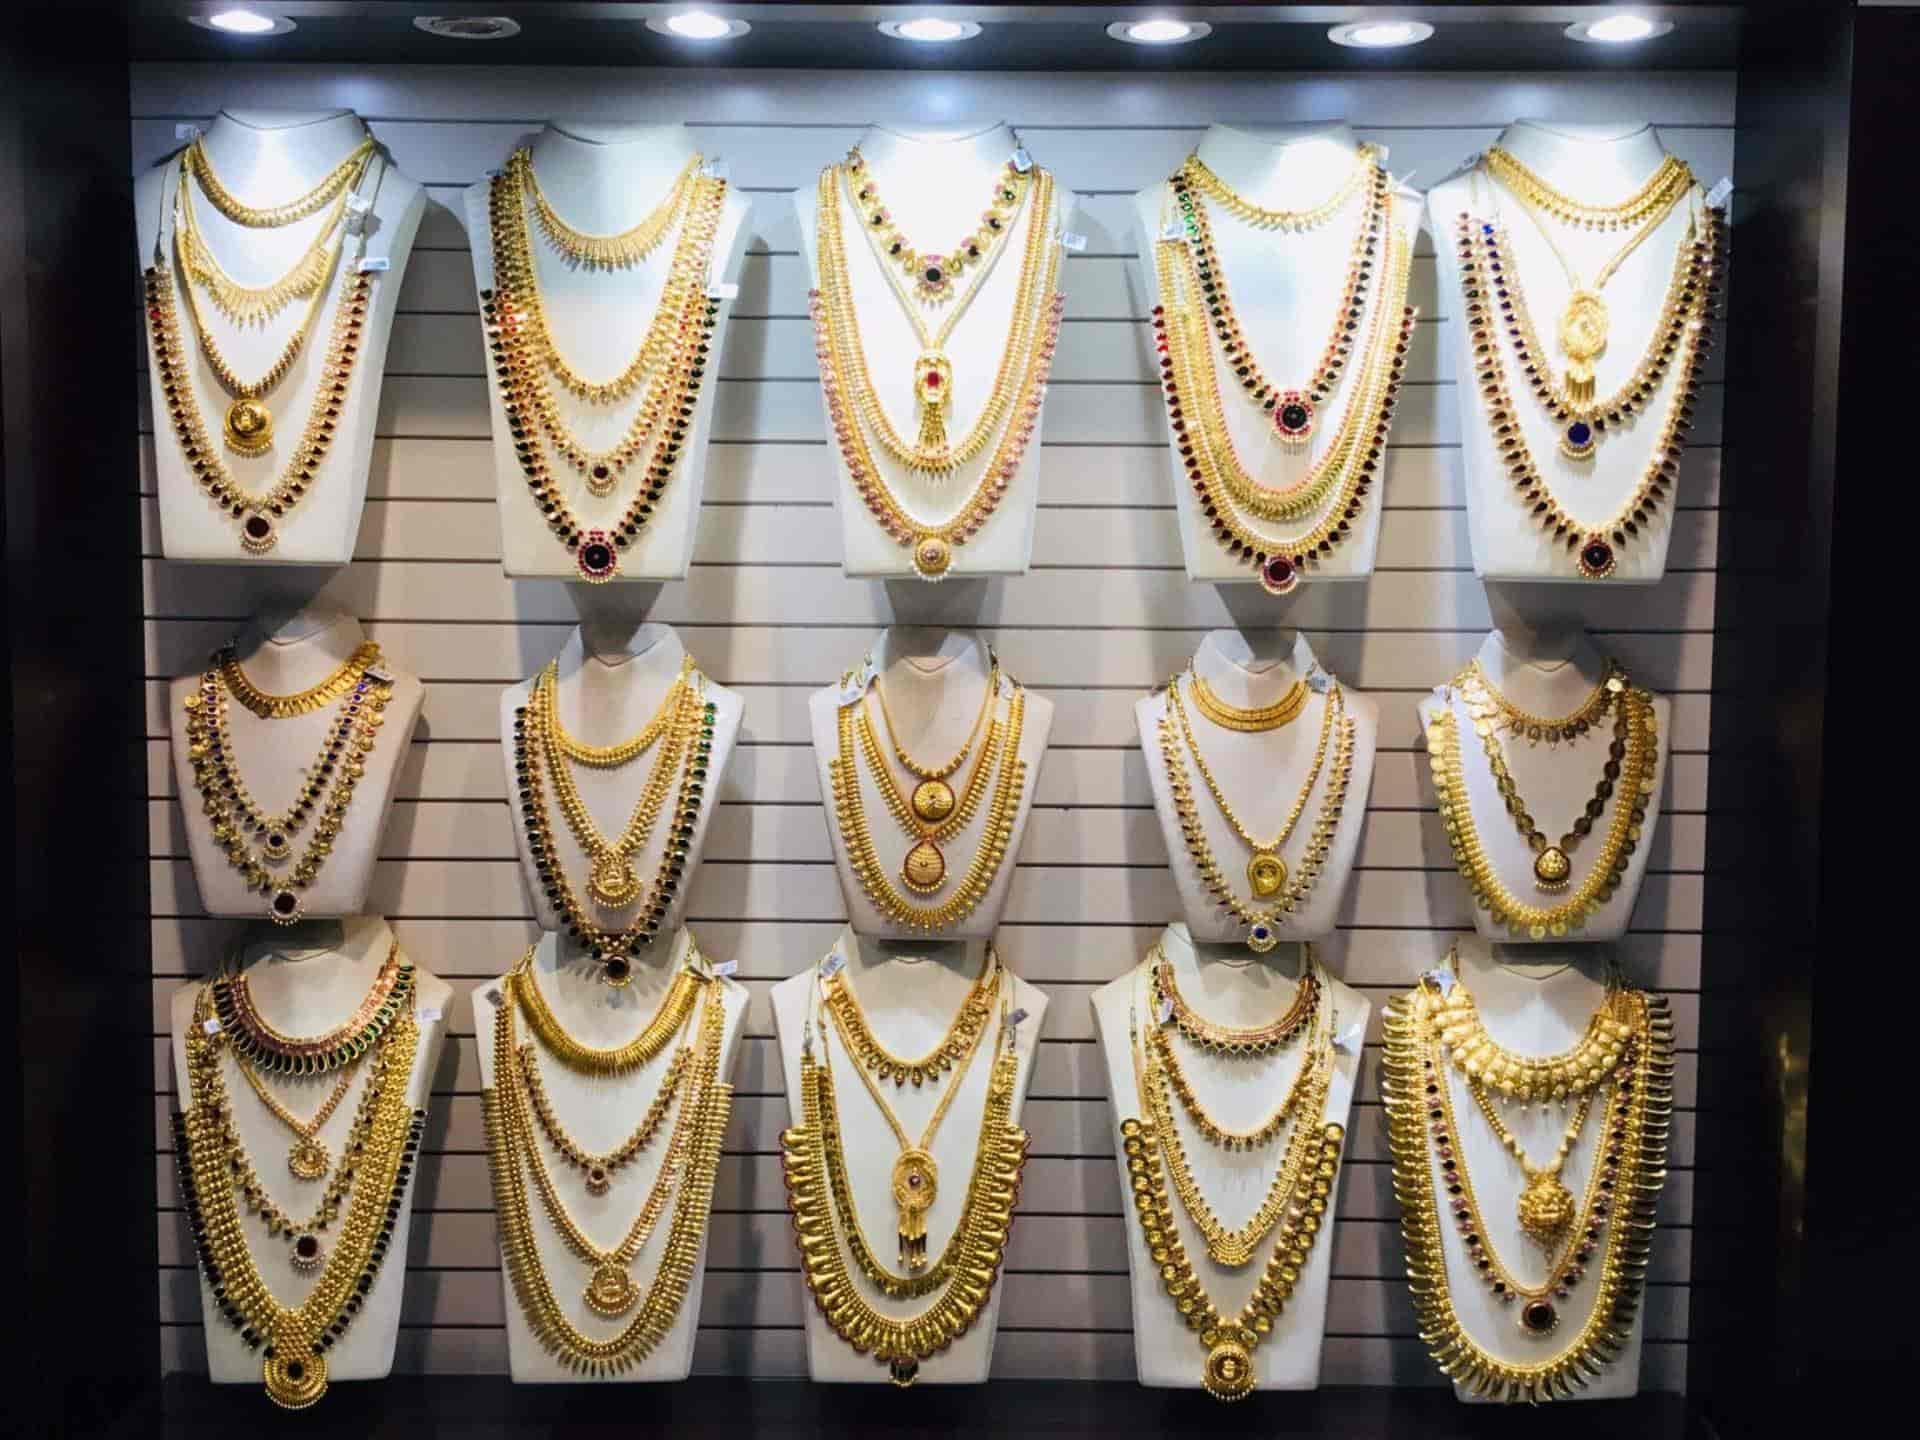 Malabar Gold & Diamond, M G Road - Jewellery Showrooms in